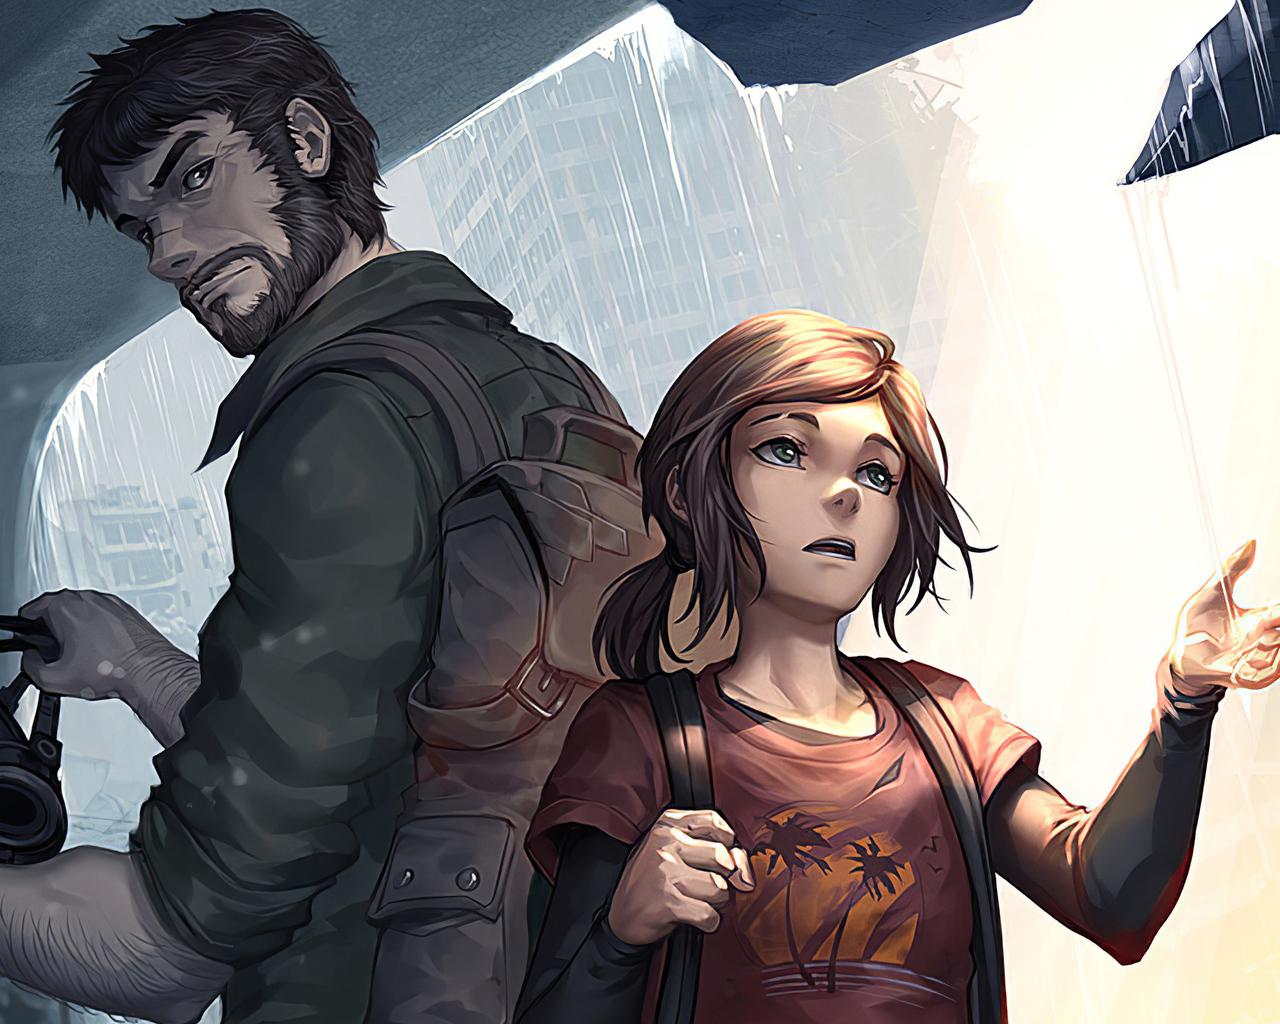 1280x1024 Joel And Ellie The Last Of Us 1280x1024 Resolution Hd 4k